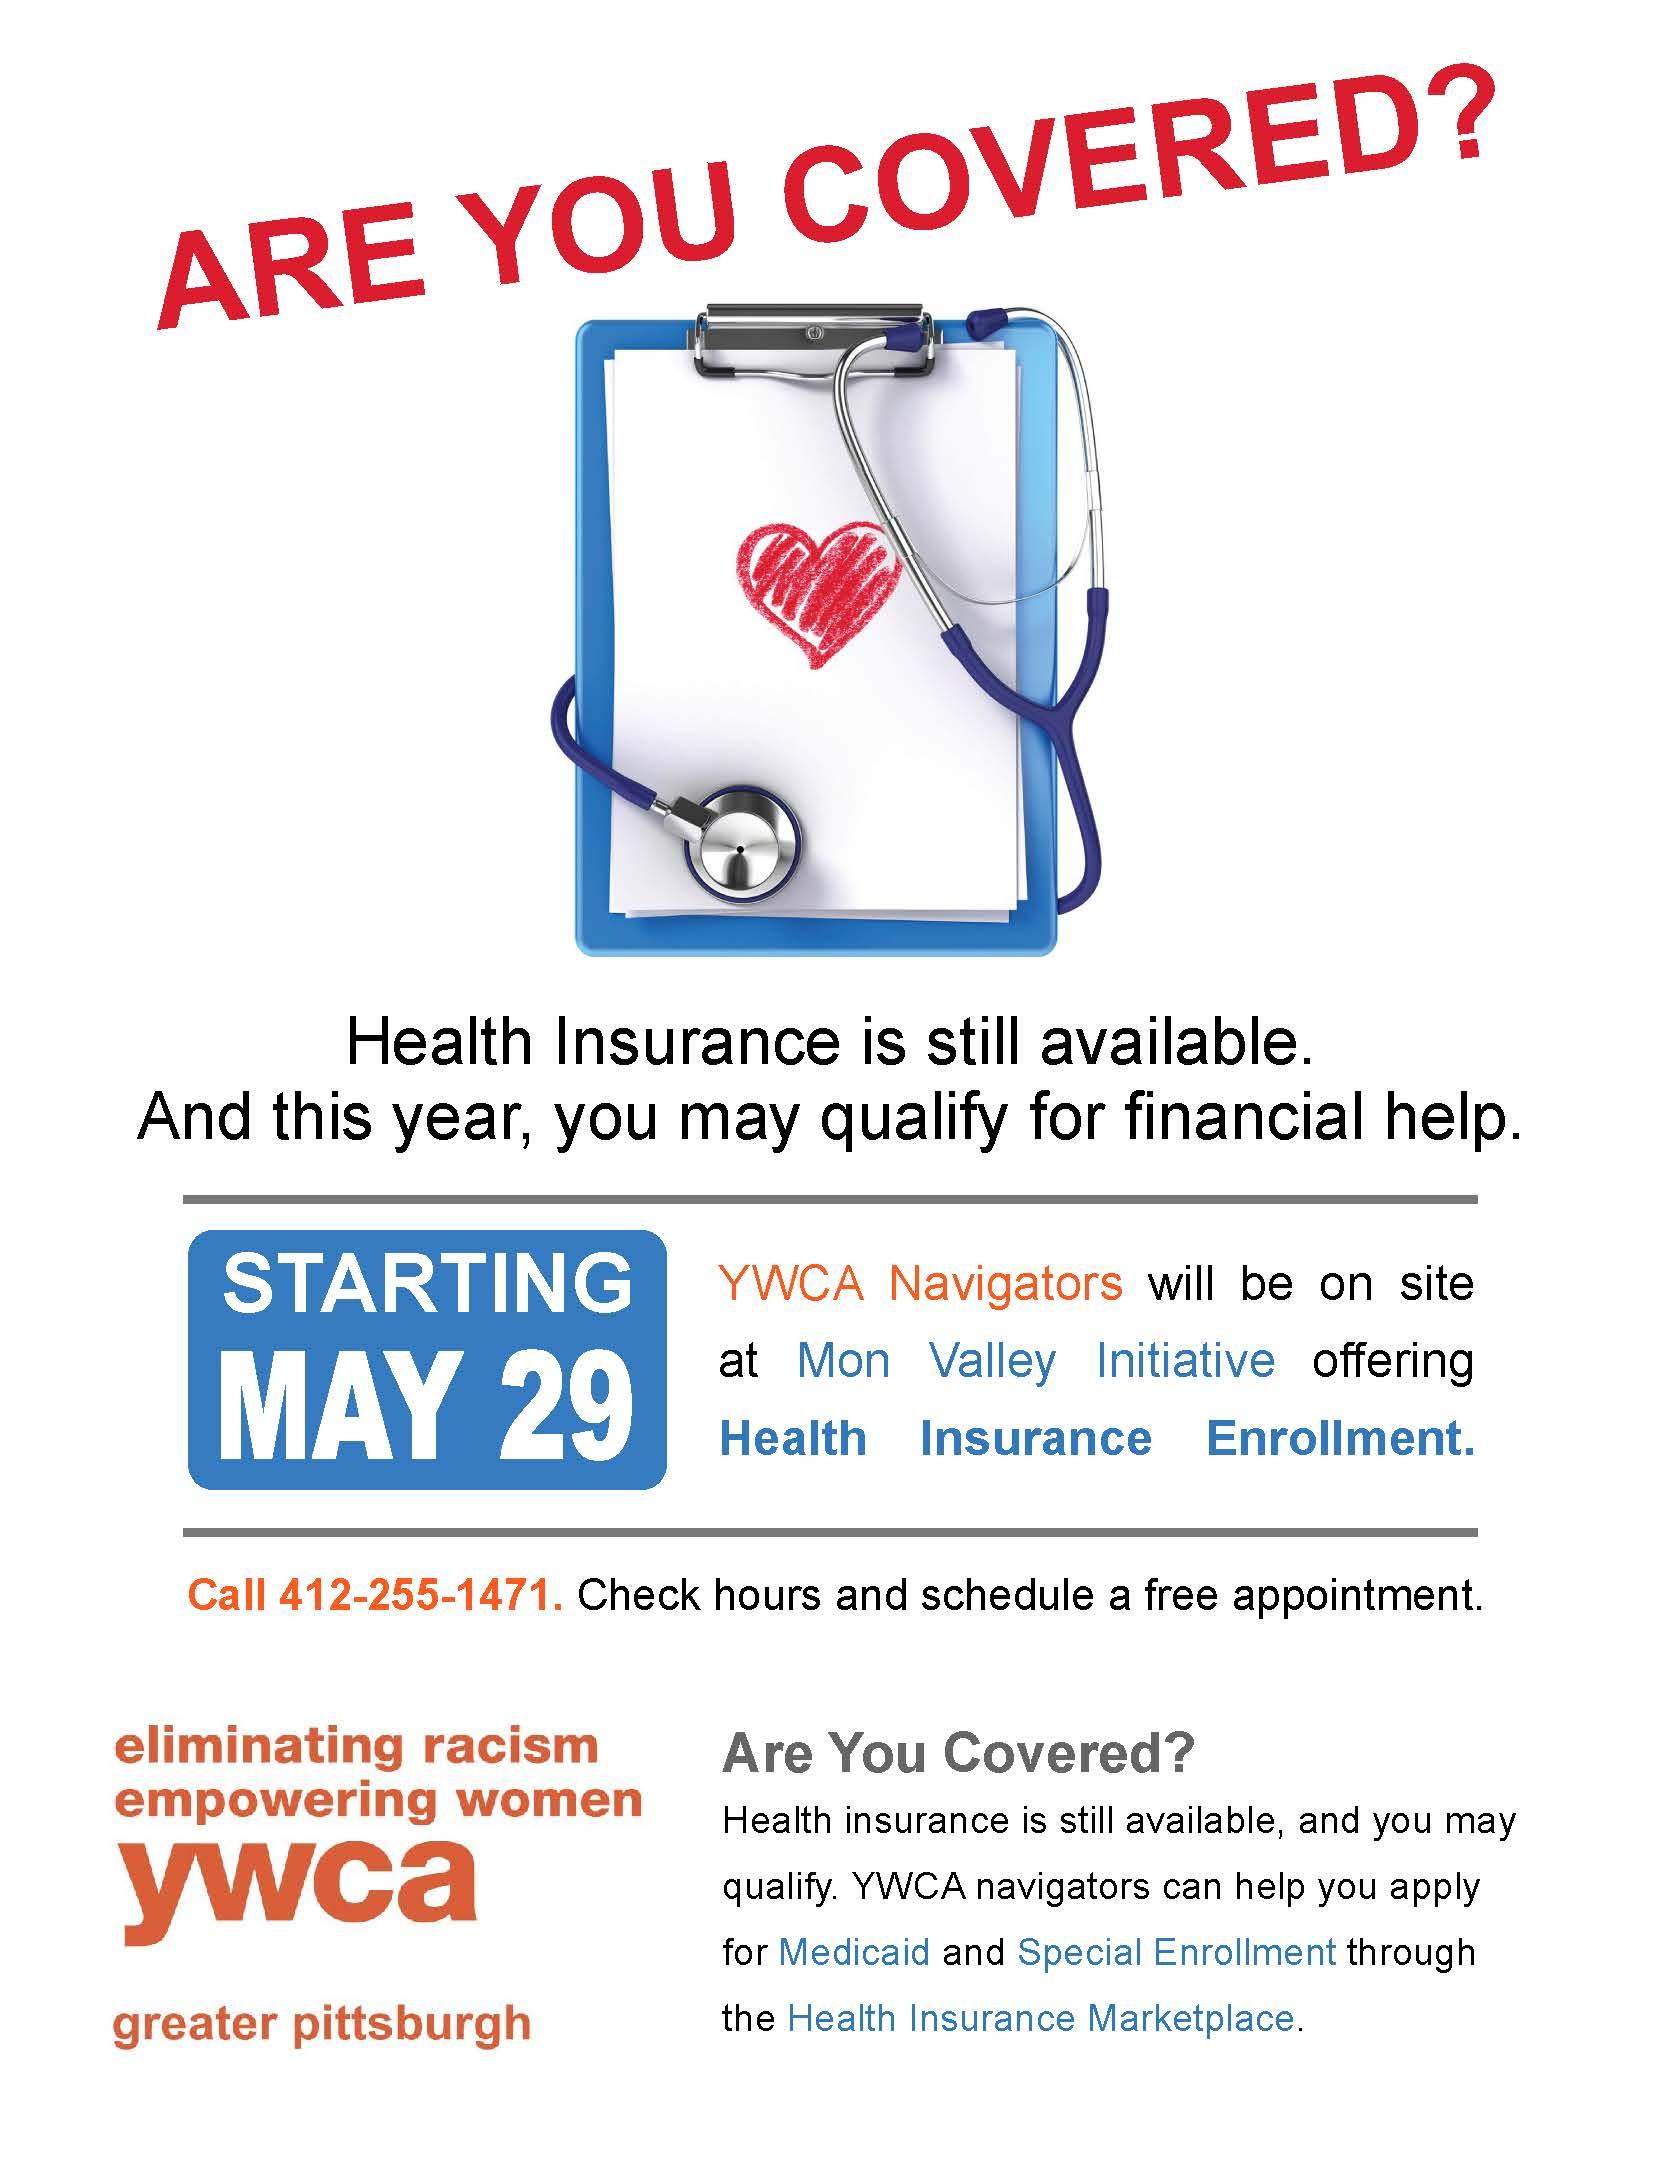 YWCA Healthcare Navigators